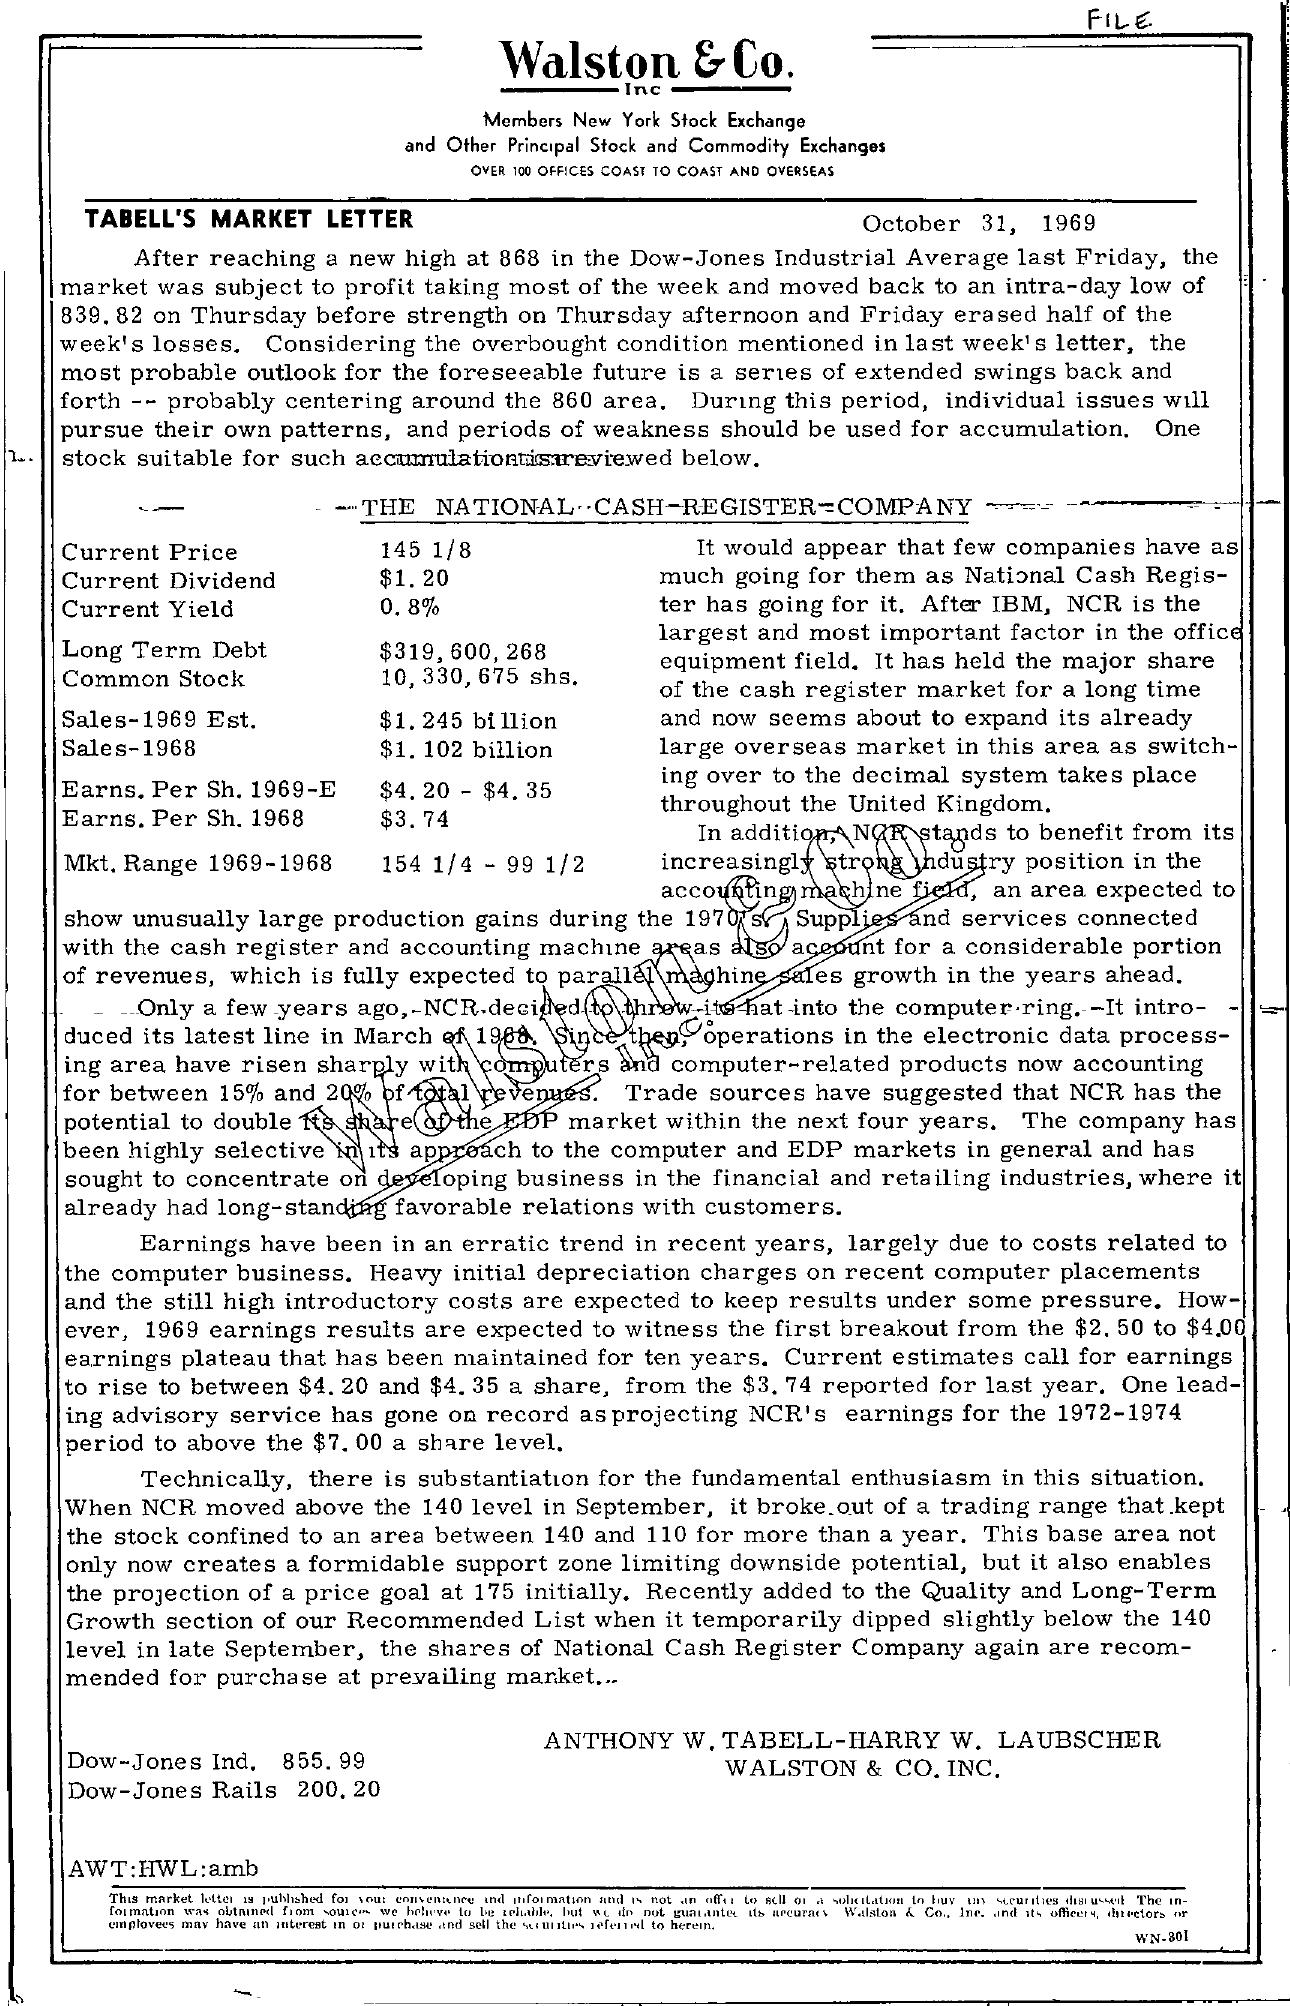 Tabell's Market Letter - October 31, 1969